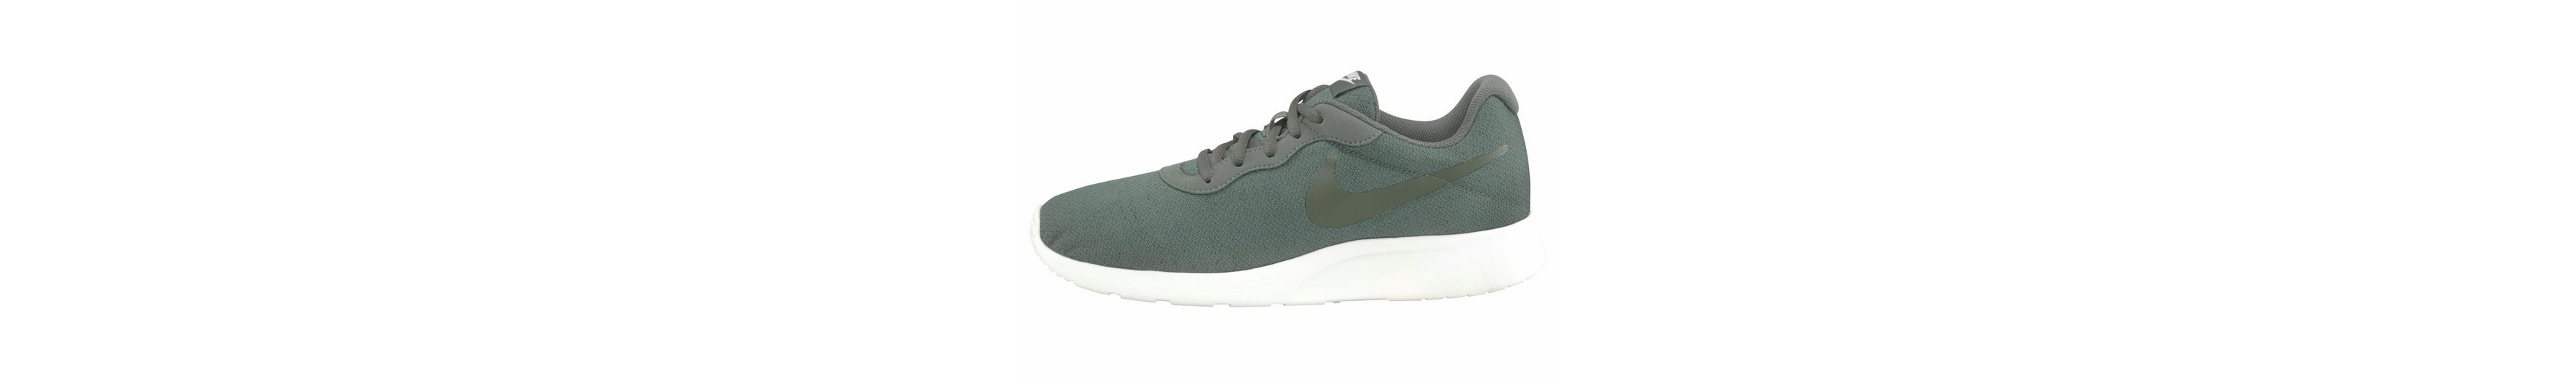 Billig Verkaufen Billig Nike Sportswear TANJUN Sneaker Kaufen Günstig Online Billig Verkauf Bester Großhandel Krt05